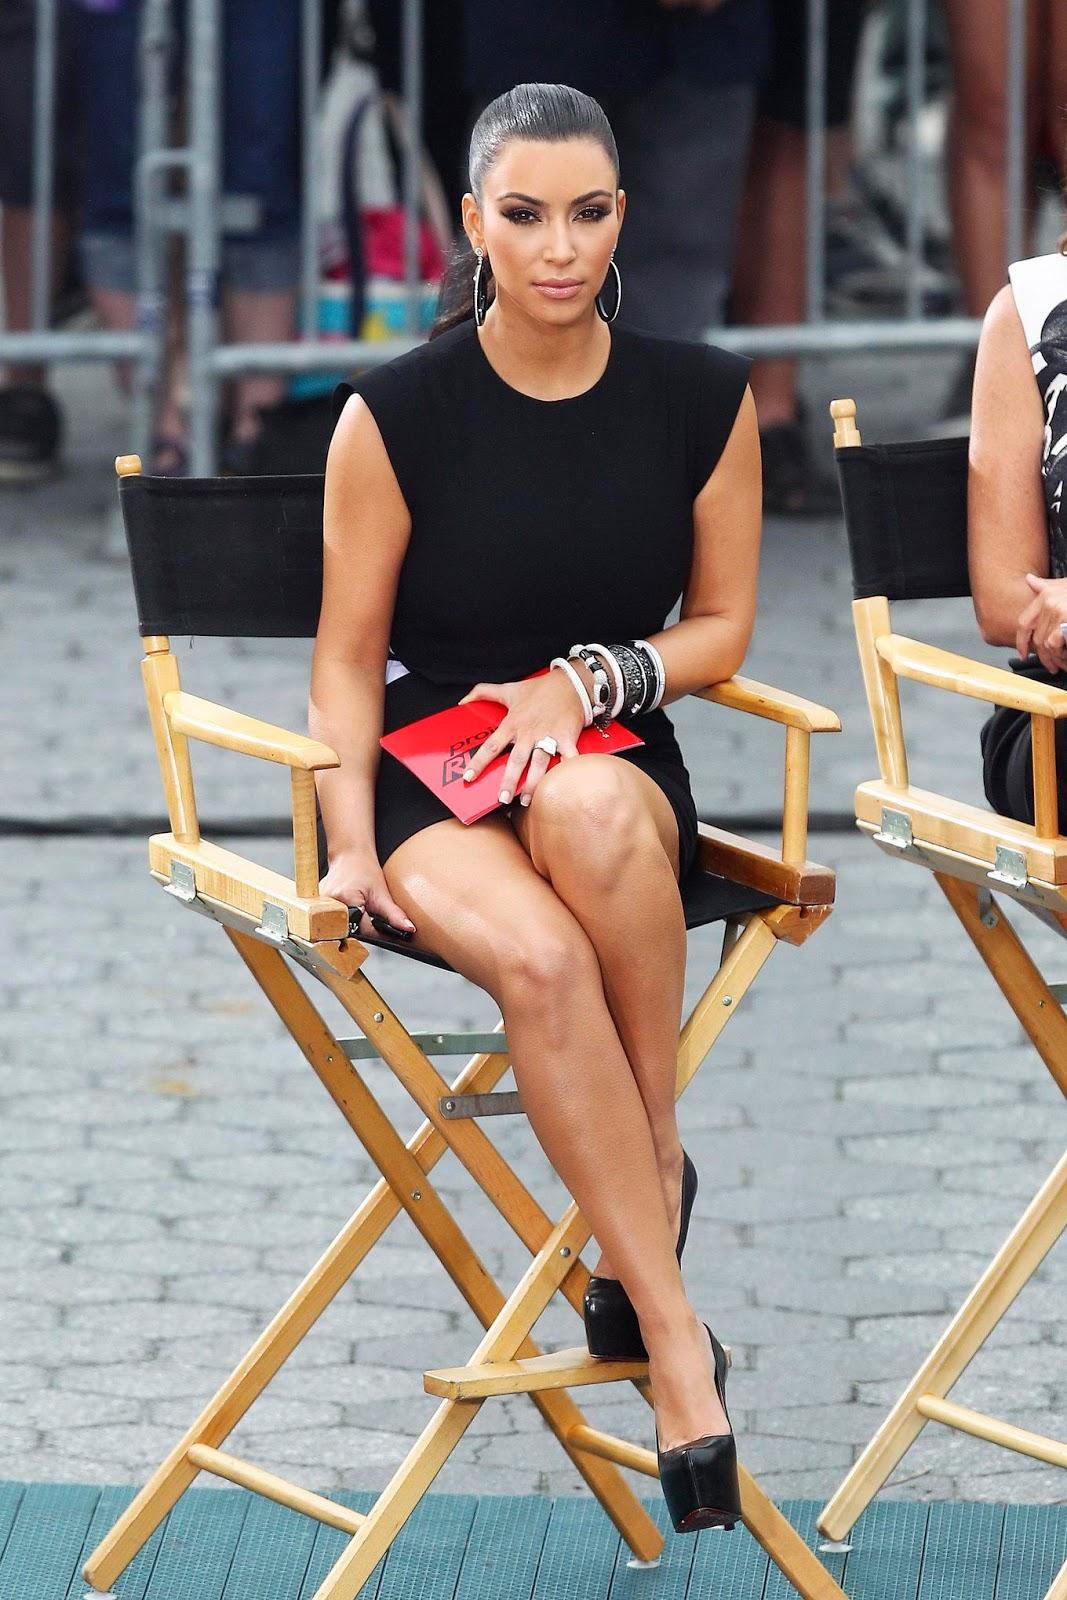 http://2.bp.blogspot.com/--C_sLNCixLU/TtjUkgebKeI/AAAAAAAADLA/M3iQqIW1Xys/s1600/kim_kardashian_11.jpg